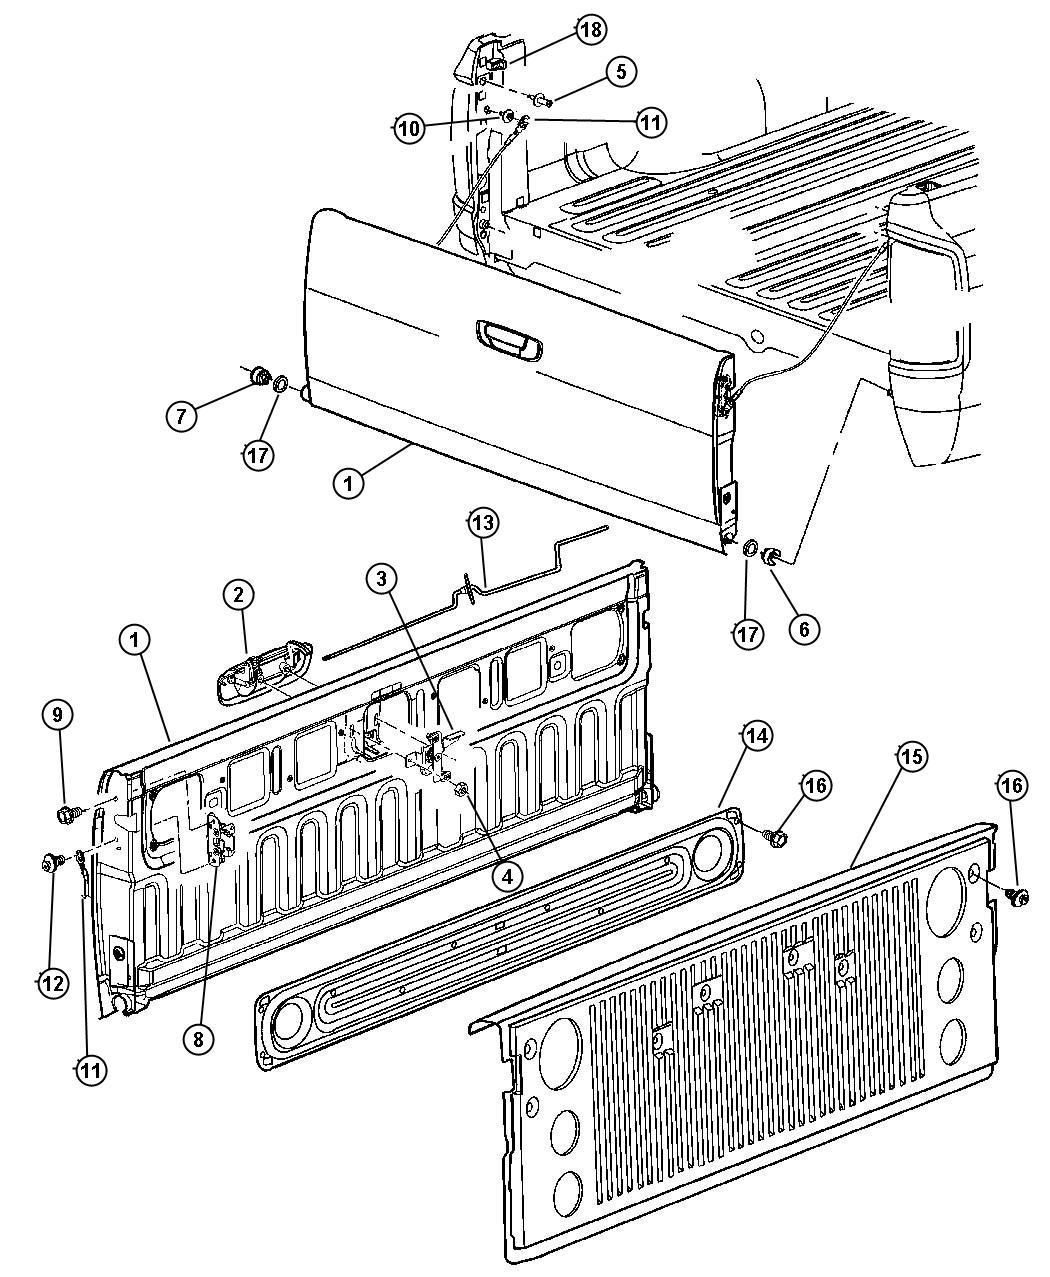 dodge ram 2500 front parts diagram 2012 engine car parts and